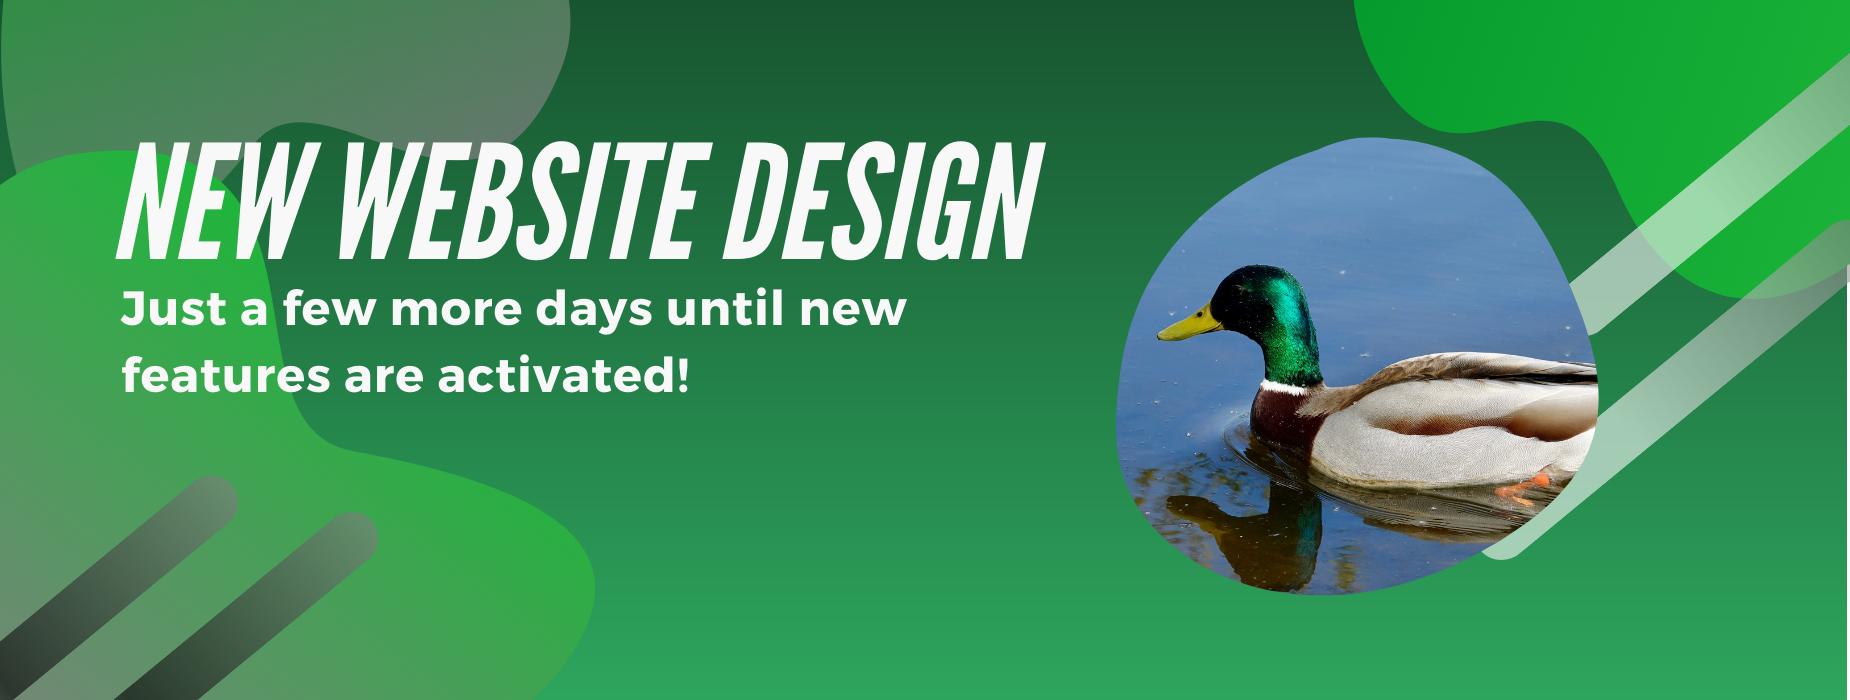 new website design banner